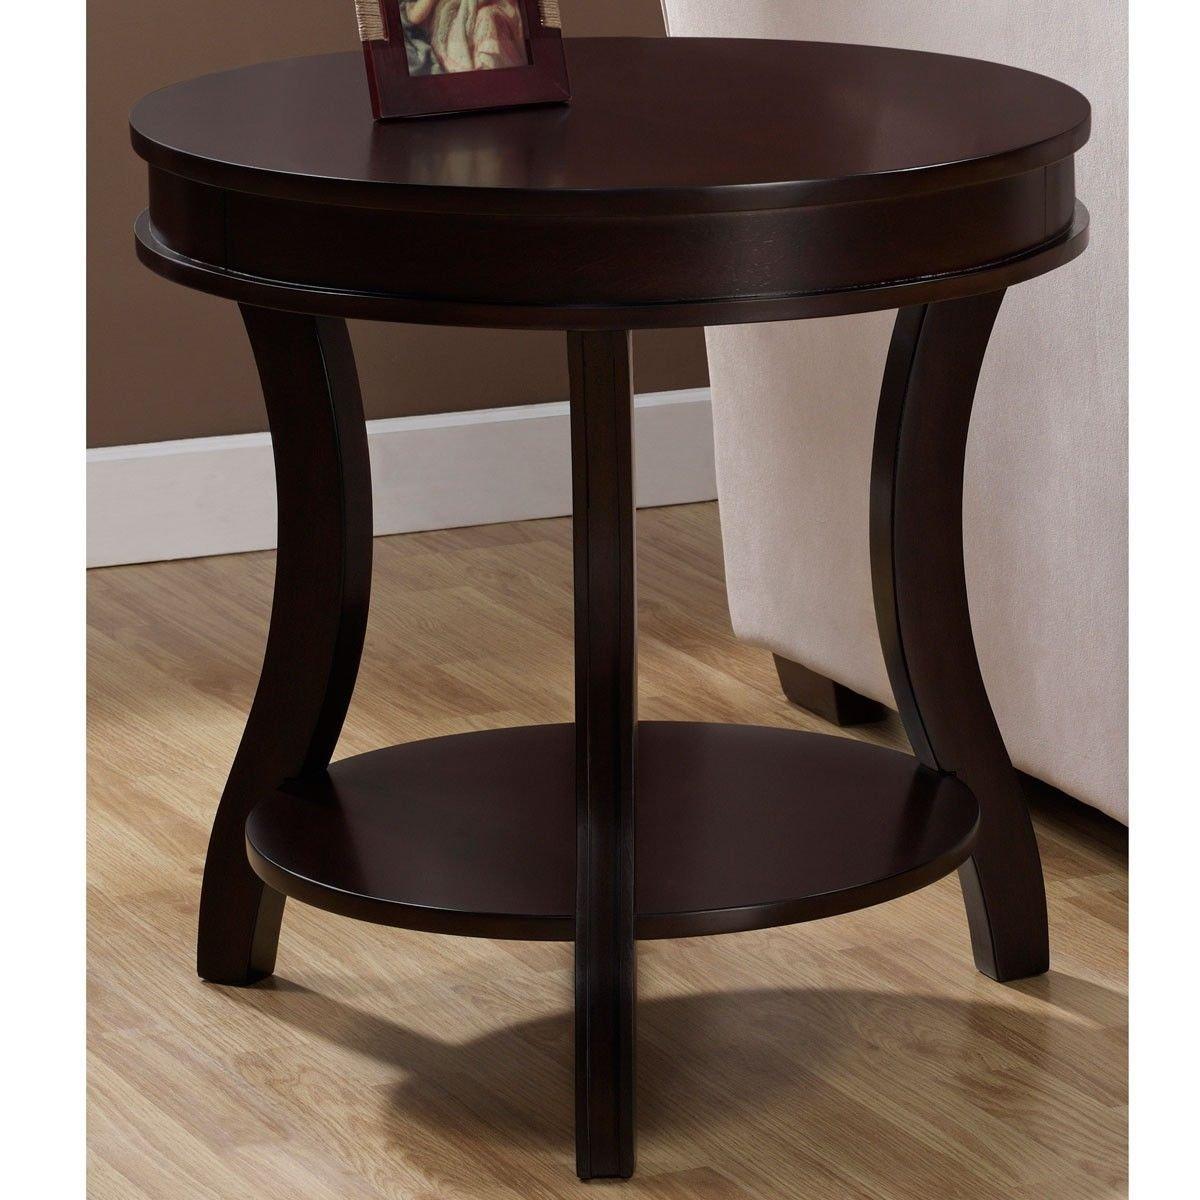 Amazon.com: Metro Shop Wyatt End Table: Kitchen & Dining